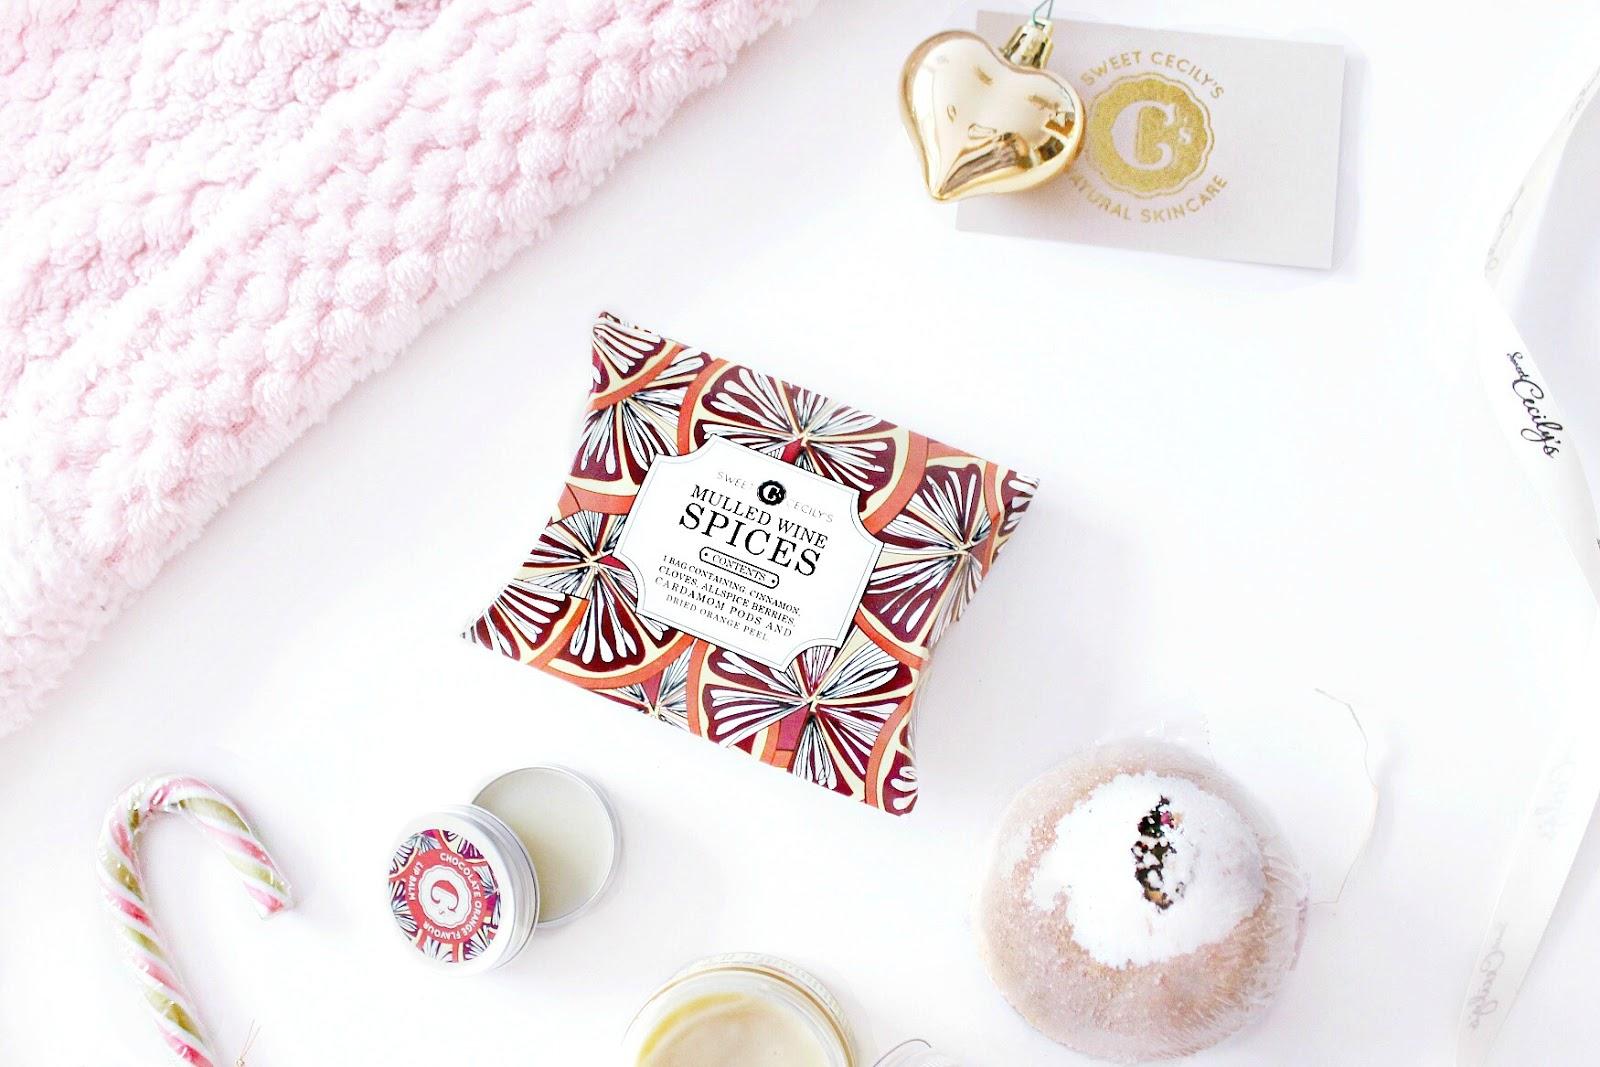 Sweet Cecily's Secret Santa Package Opening*